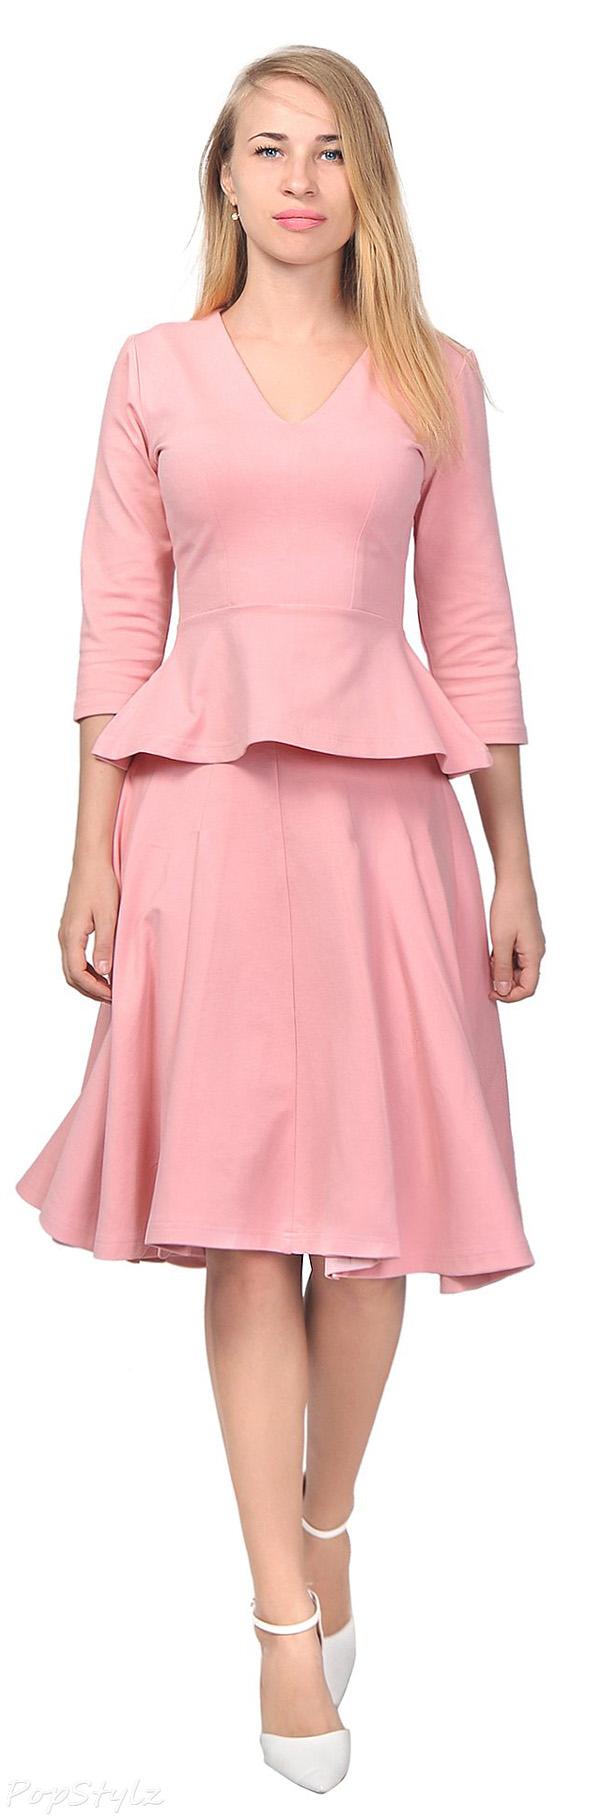 Pretty Peplum Shirt Top Suit | clothing | Pinterest | Ropa